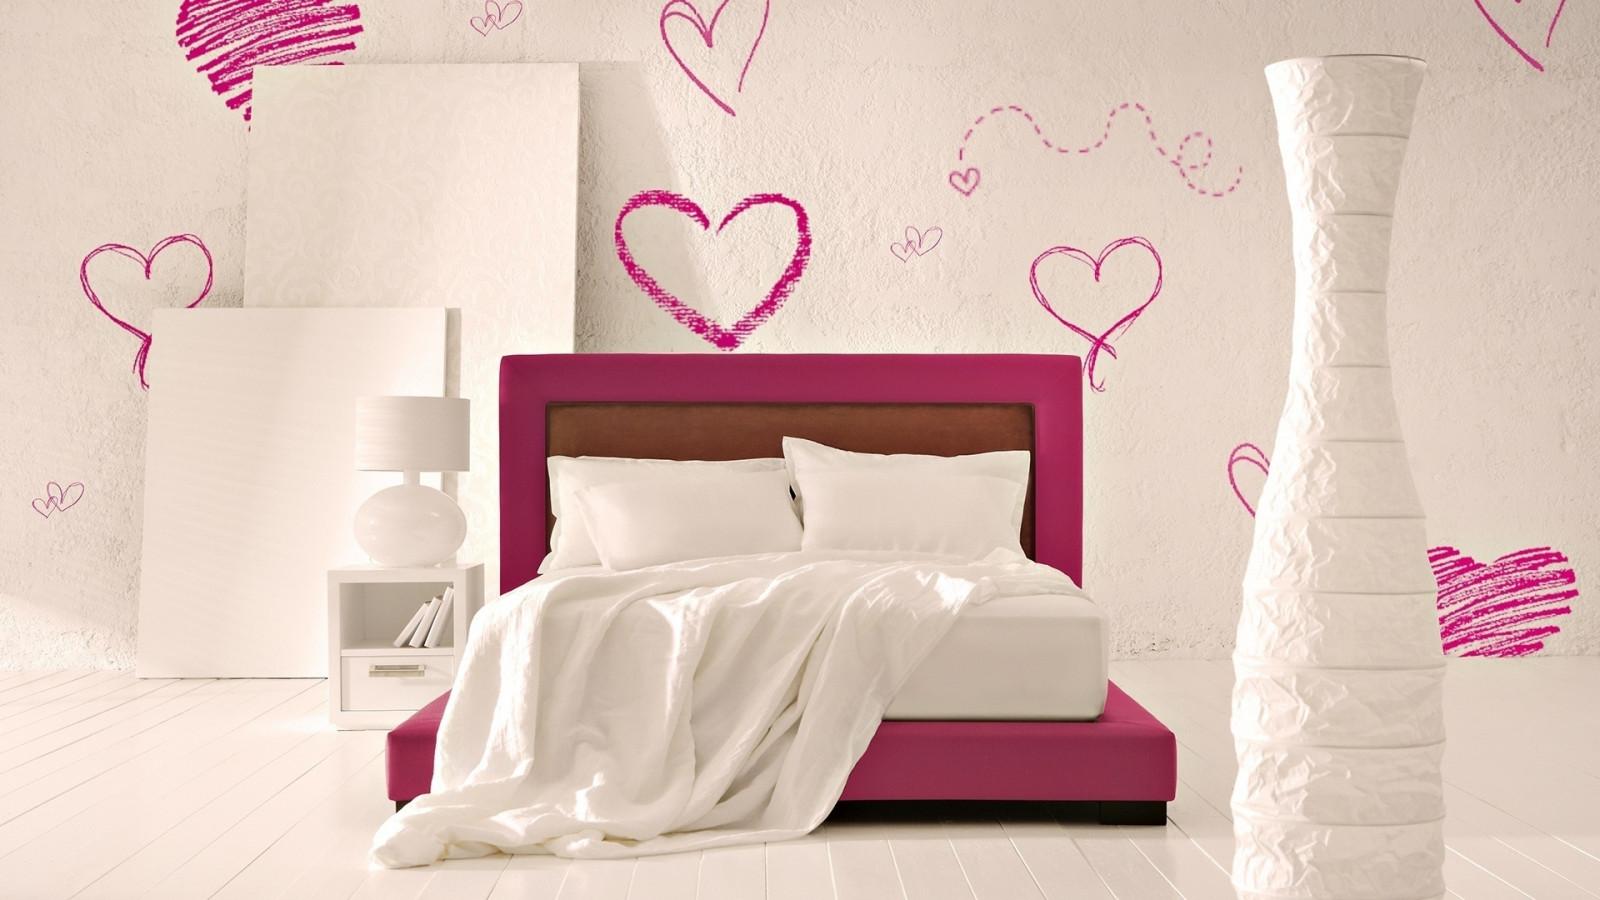 Wallpaper White Heart Room Wall Pink Interior Design